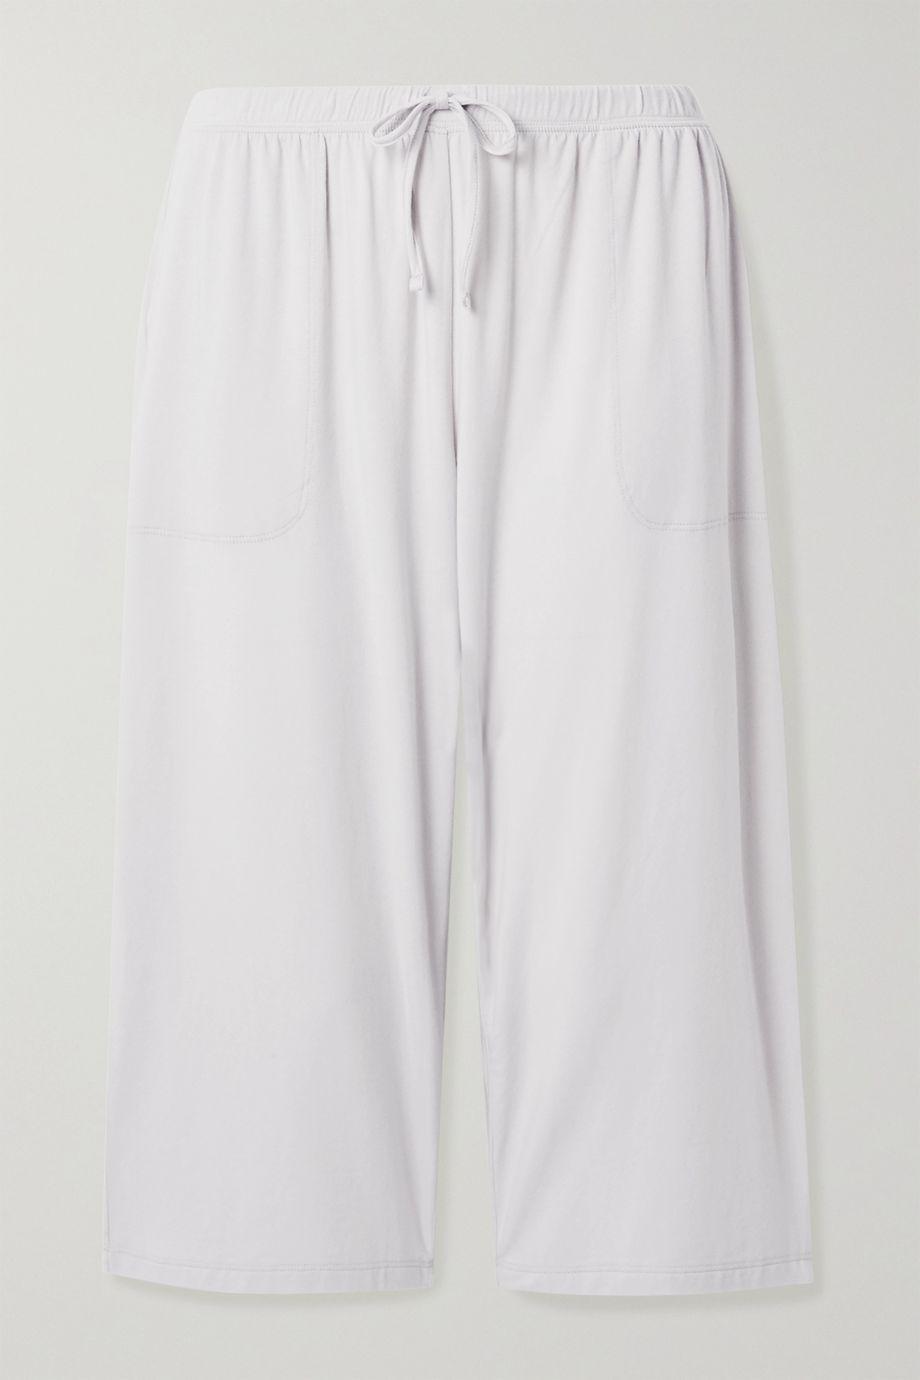 Skin Marlee cropped stretch-jersey pajama pants